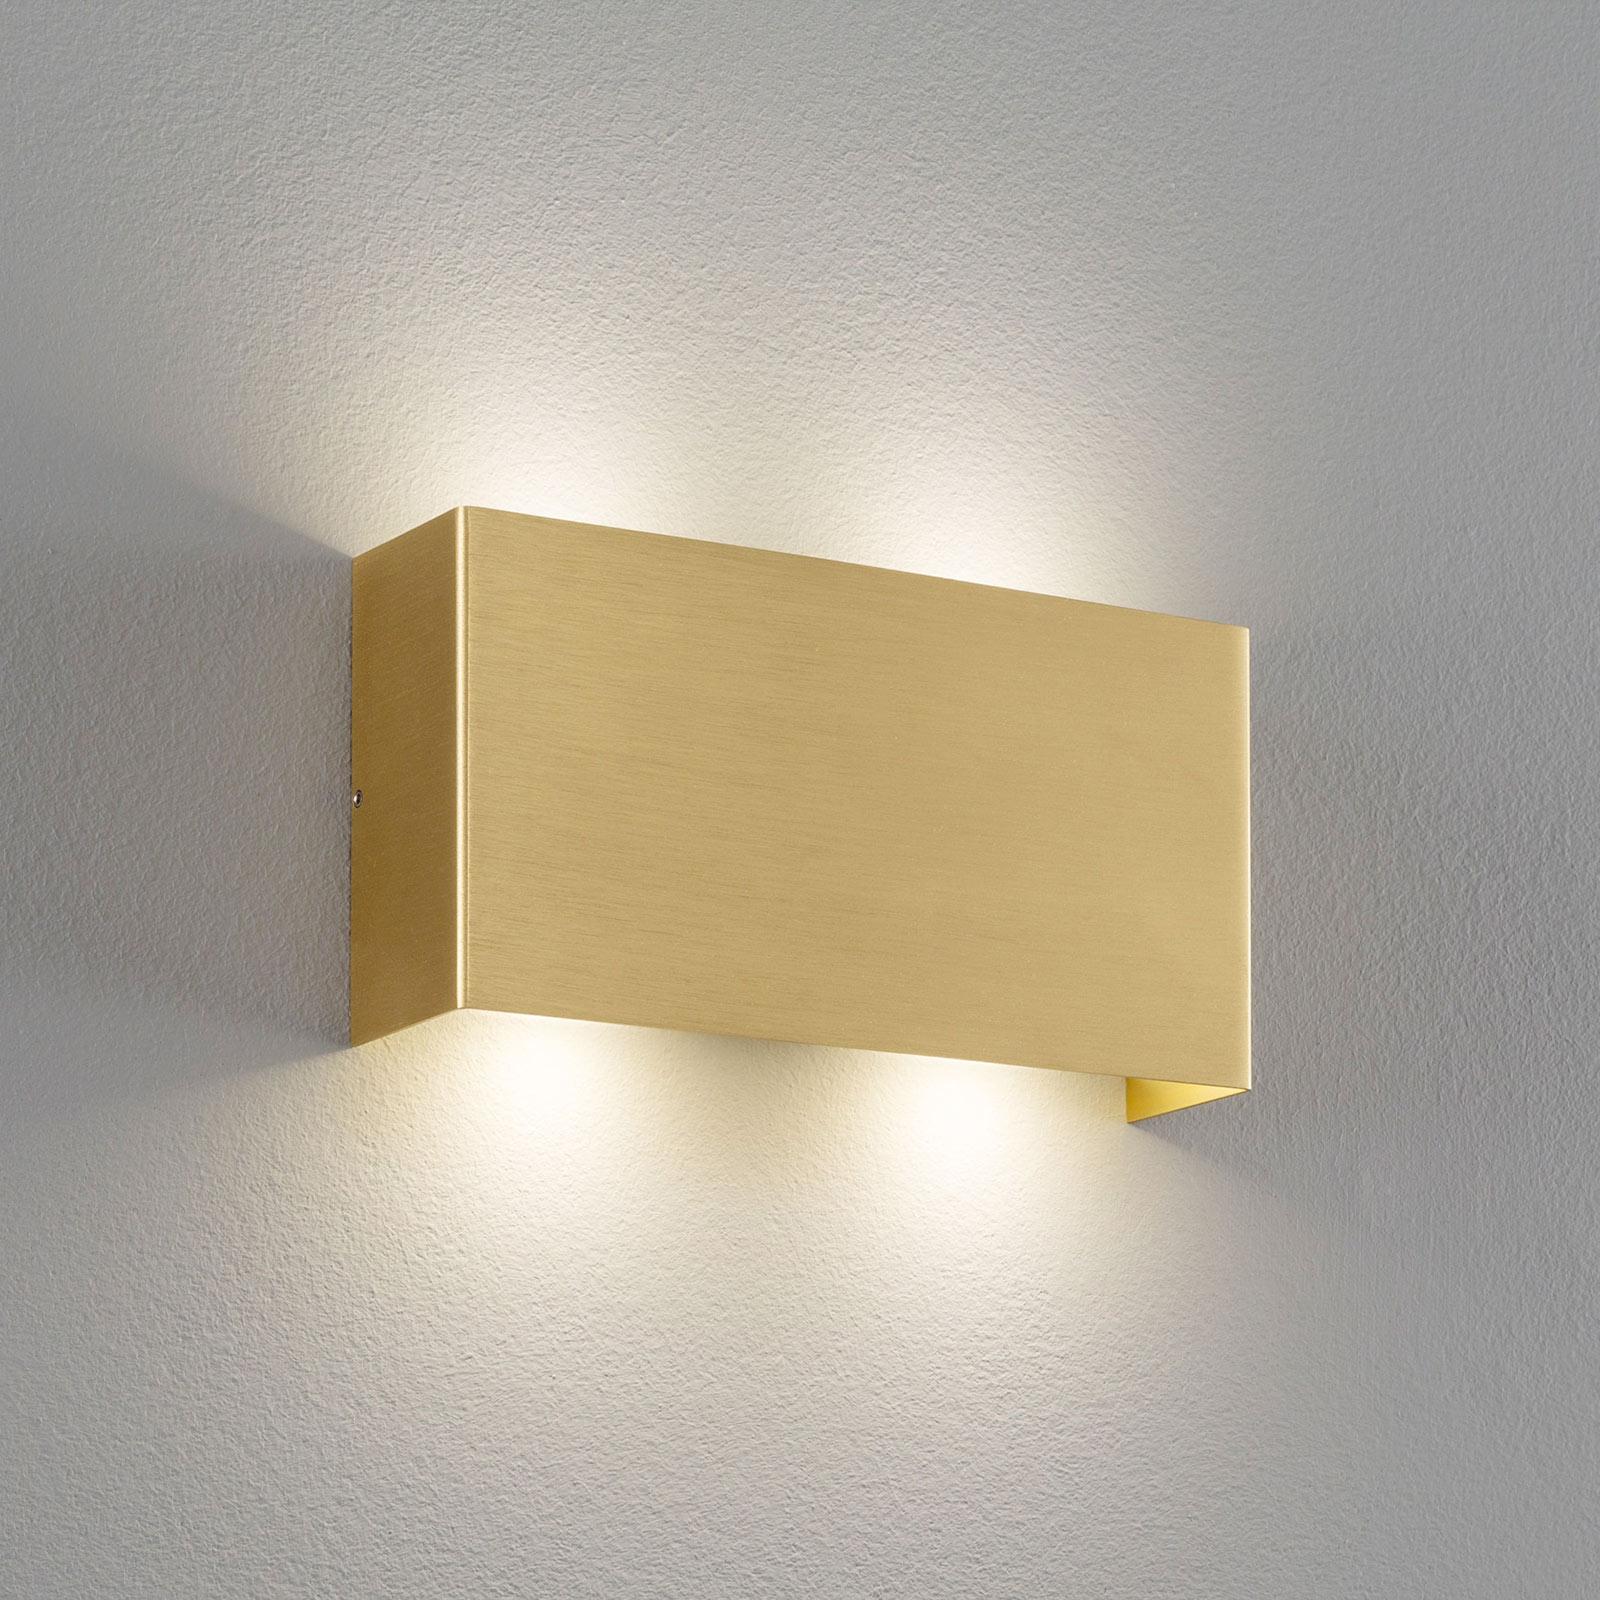 Lucande Maja wandlamp, messing mat, 22 cm